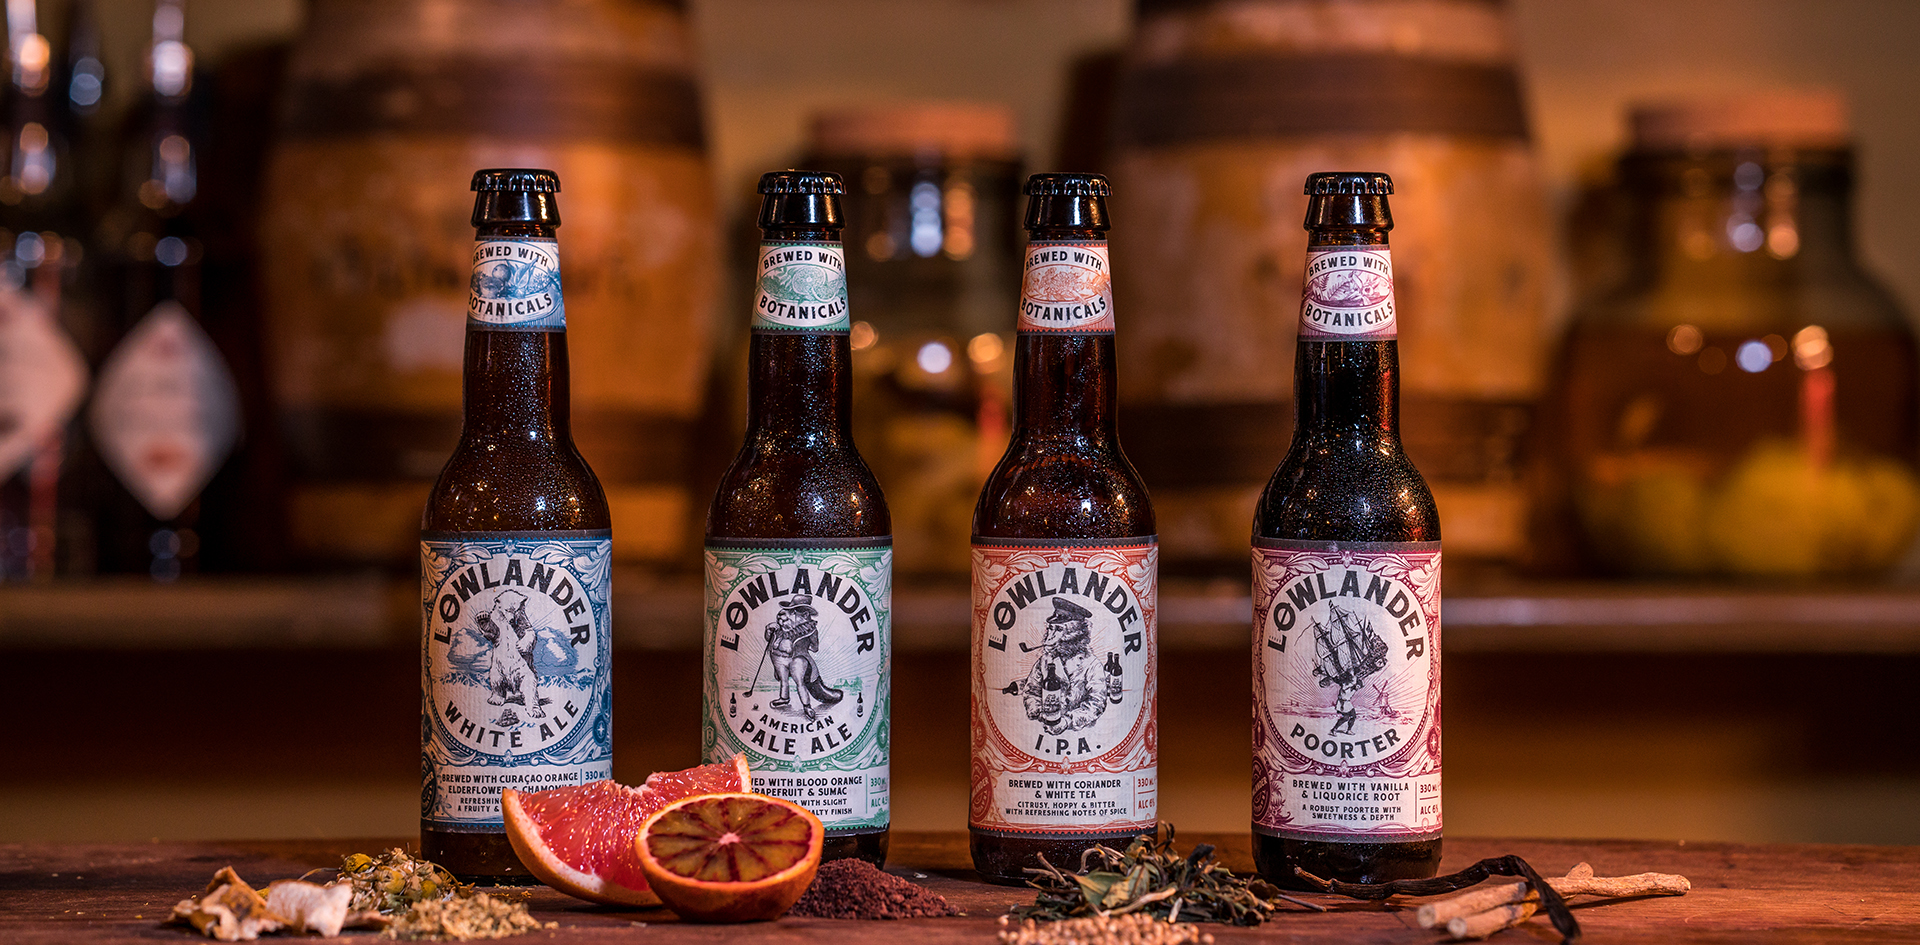 nectar-utrecht-pils-bier-brouwerij-nederland-streekbier-amsterdam-lowlander-foto01